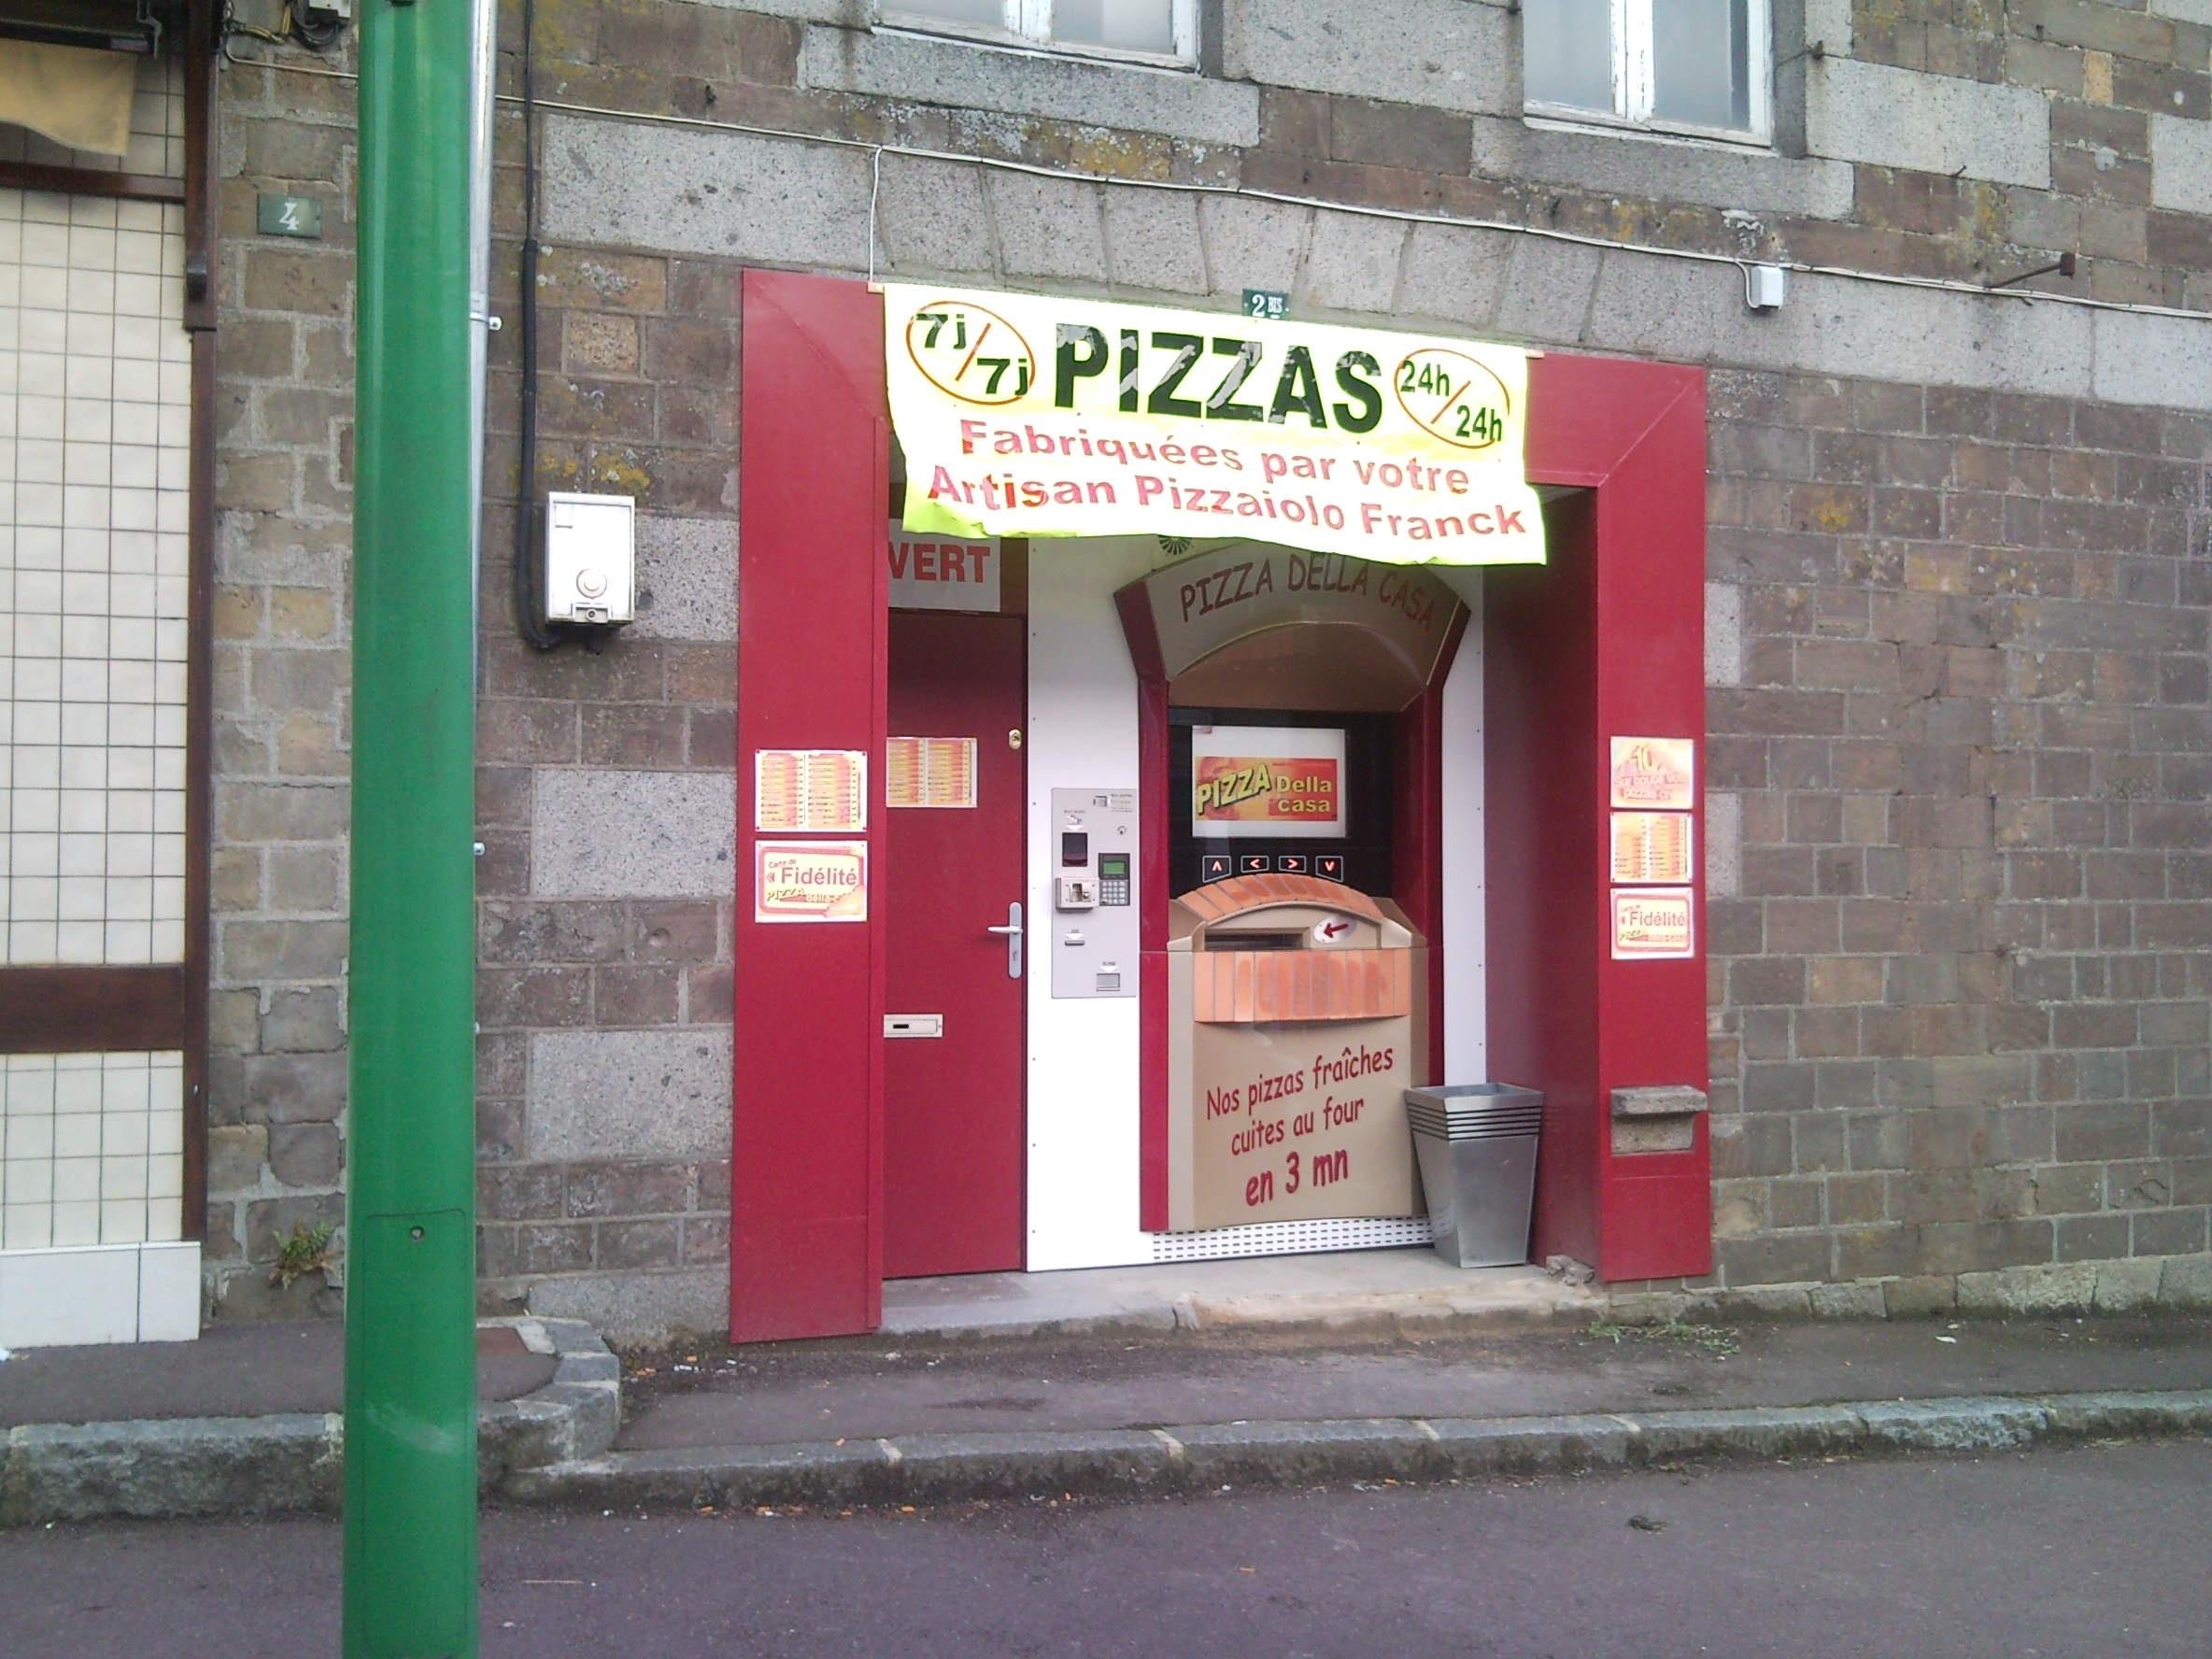 2 me distributeur pizza della casa percy adial pizzadoor. Black Bedroom Furniture Sets. Home Design Ideas